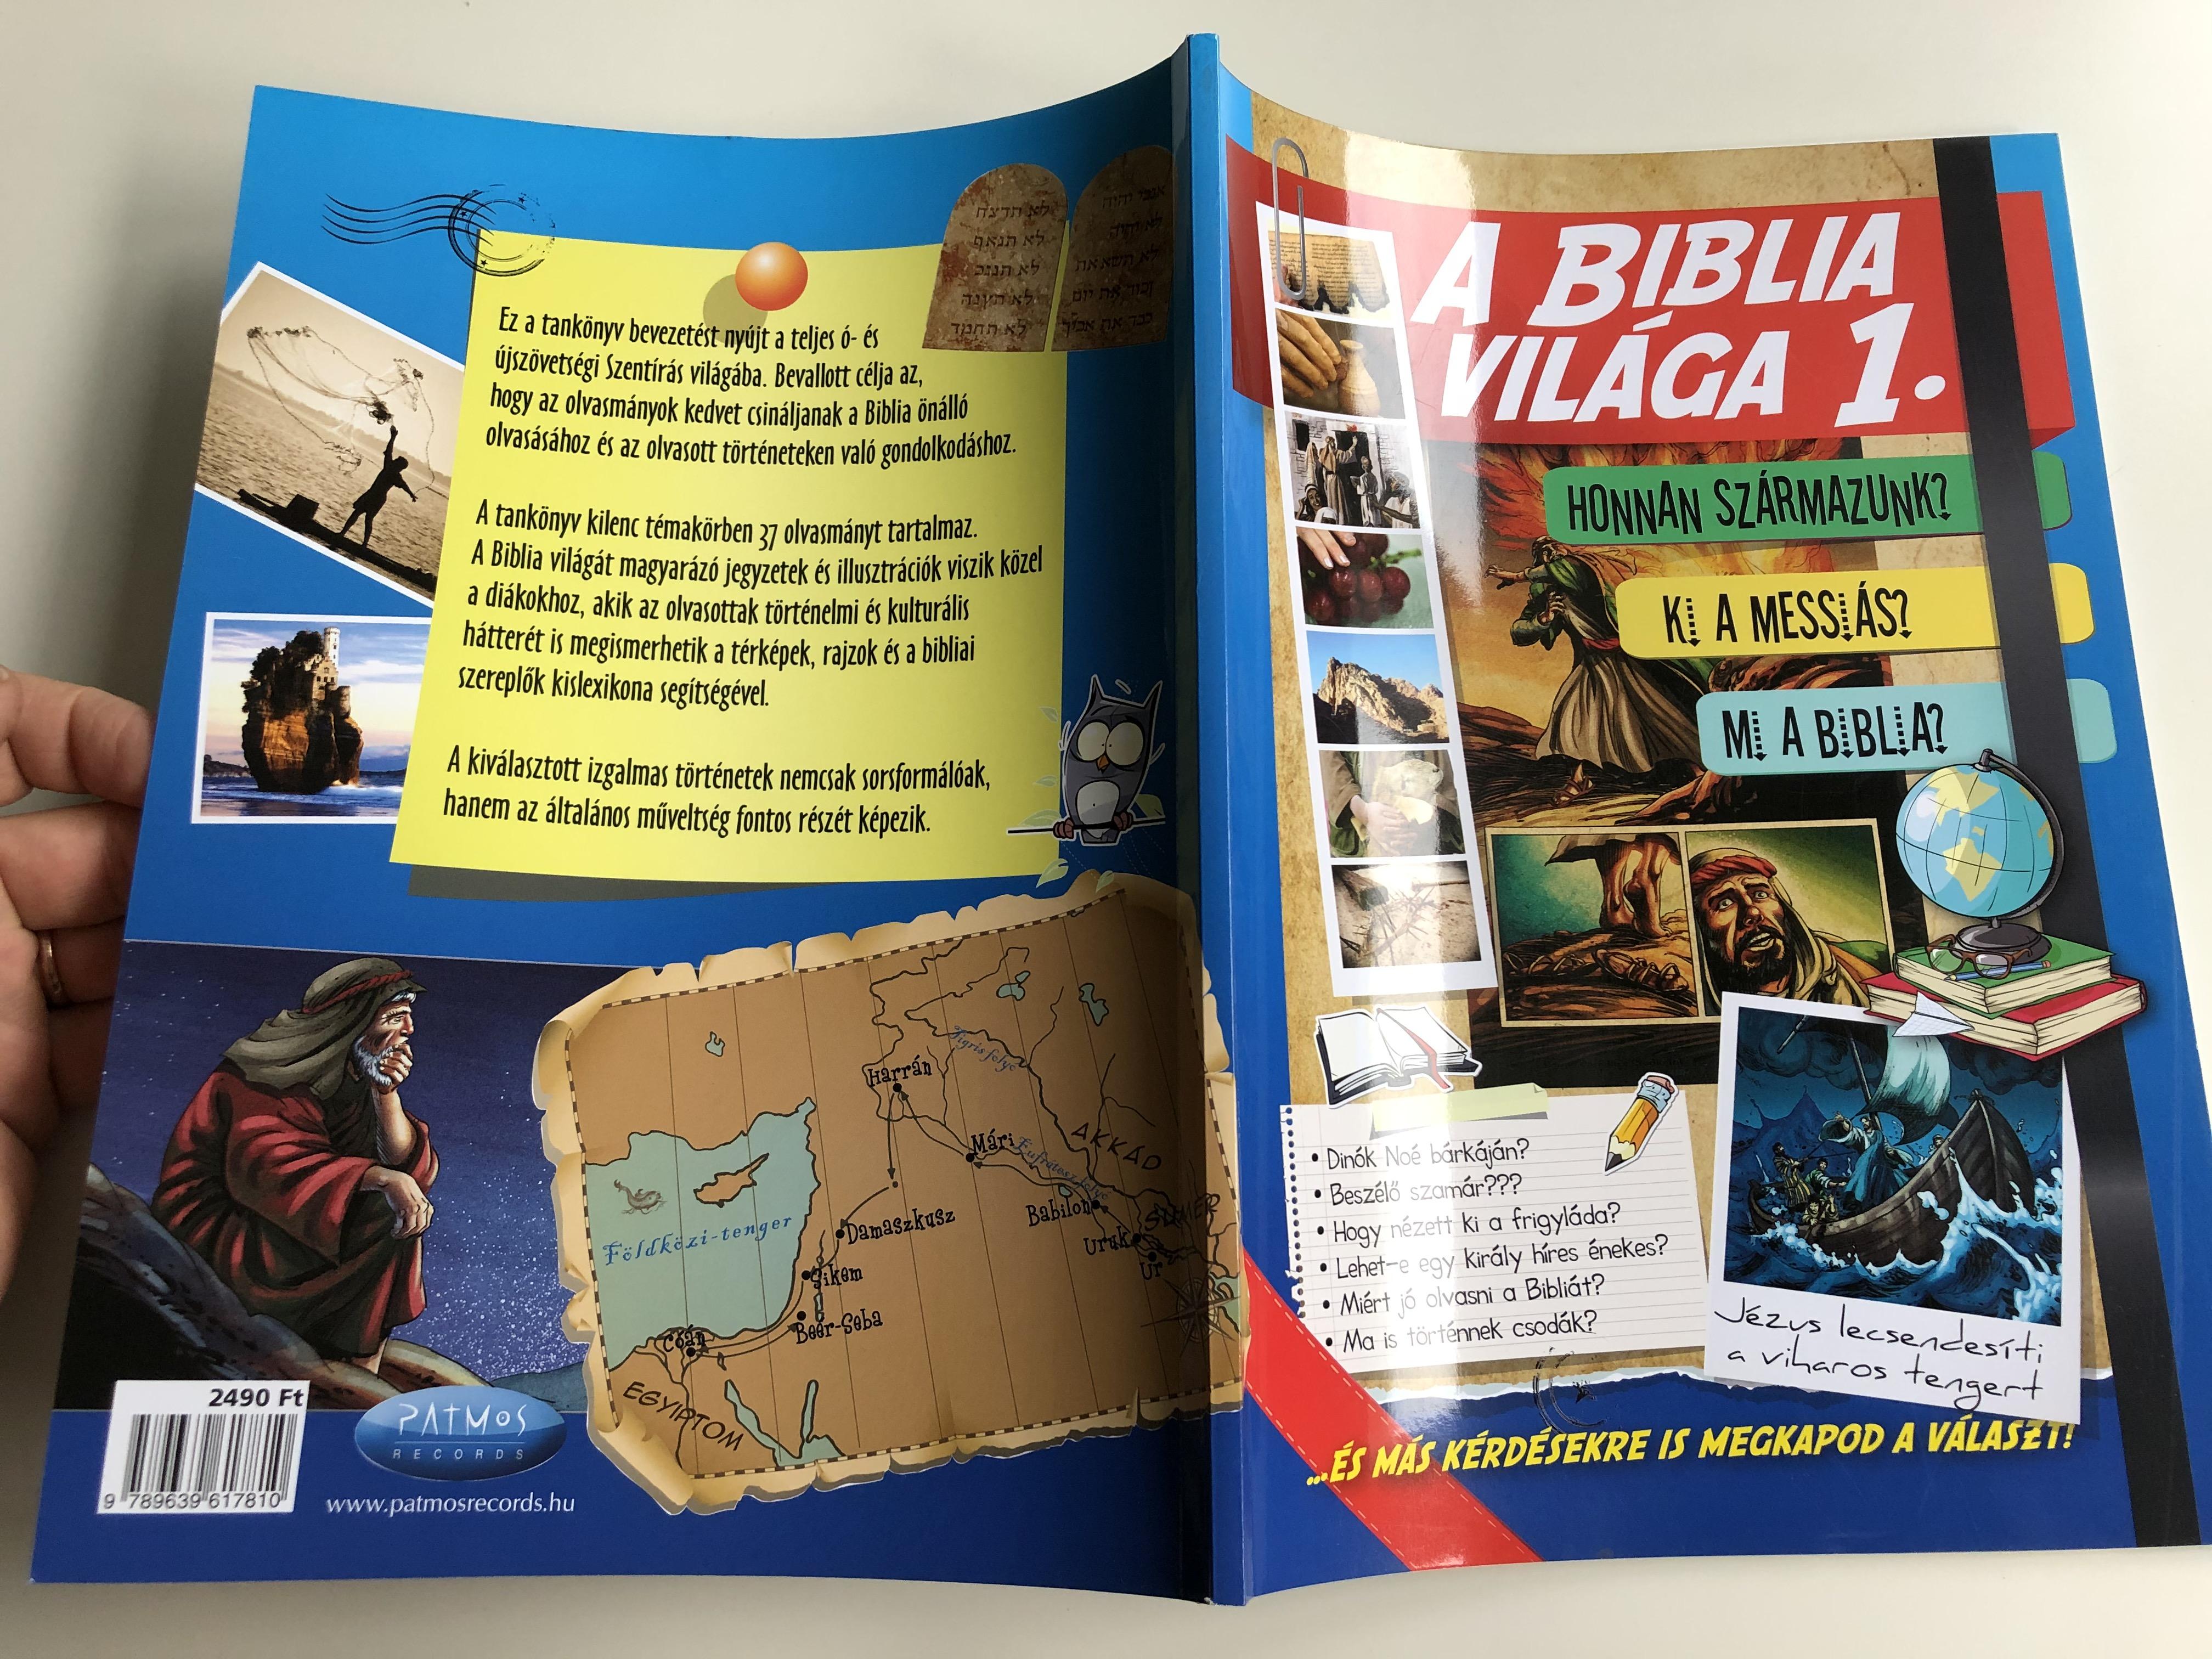 -a-biblia-vil-ga-1.-by-csalog-eszter-gr-ll-tibor-hack-m-rta-the-world-of-the-bible-19.jpg